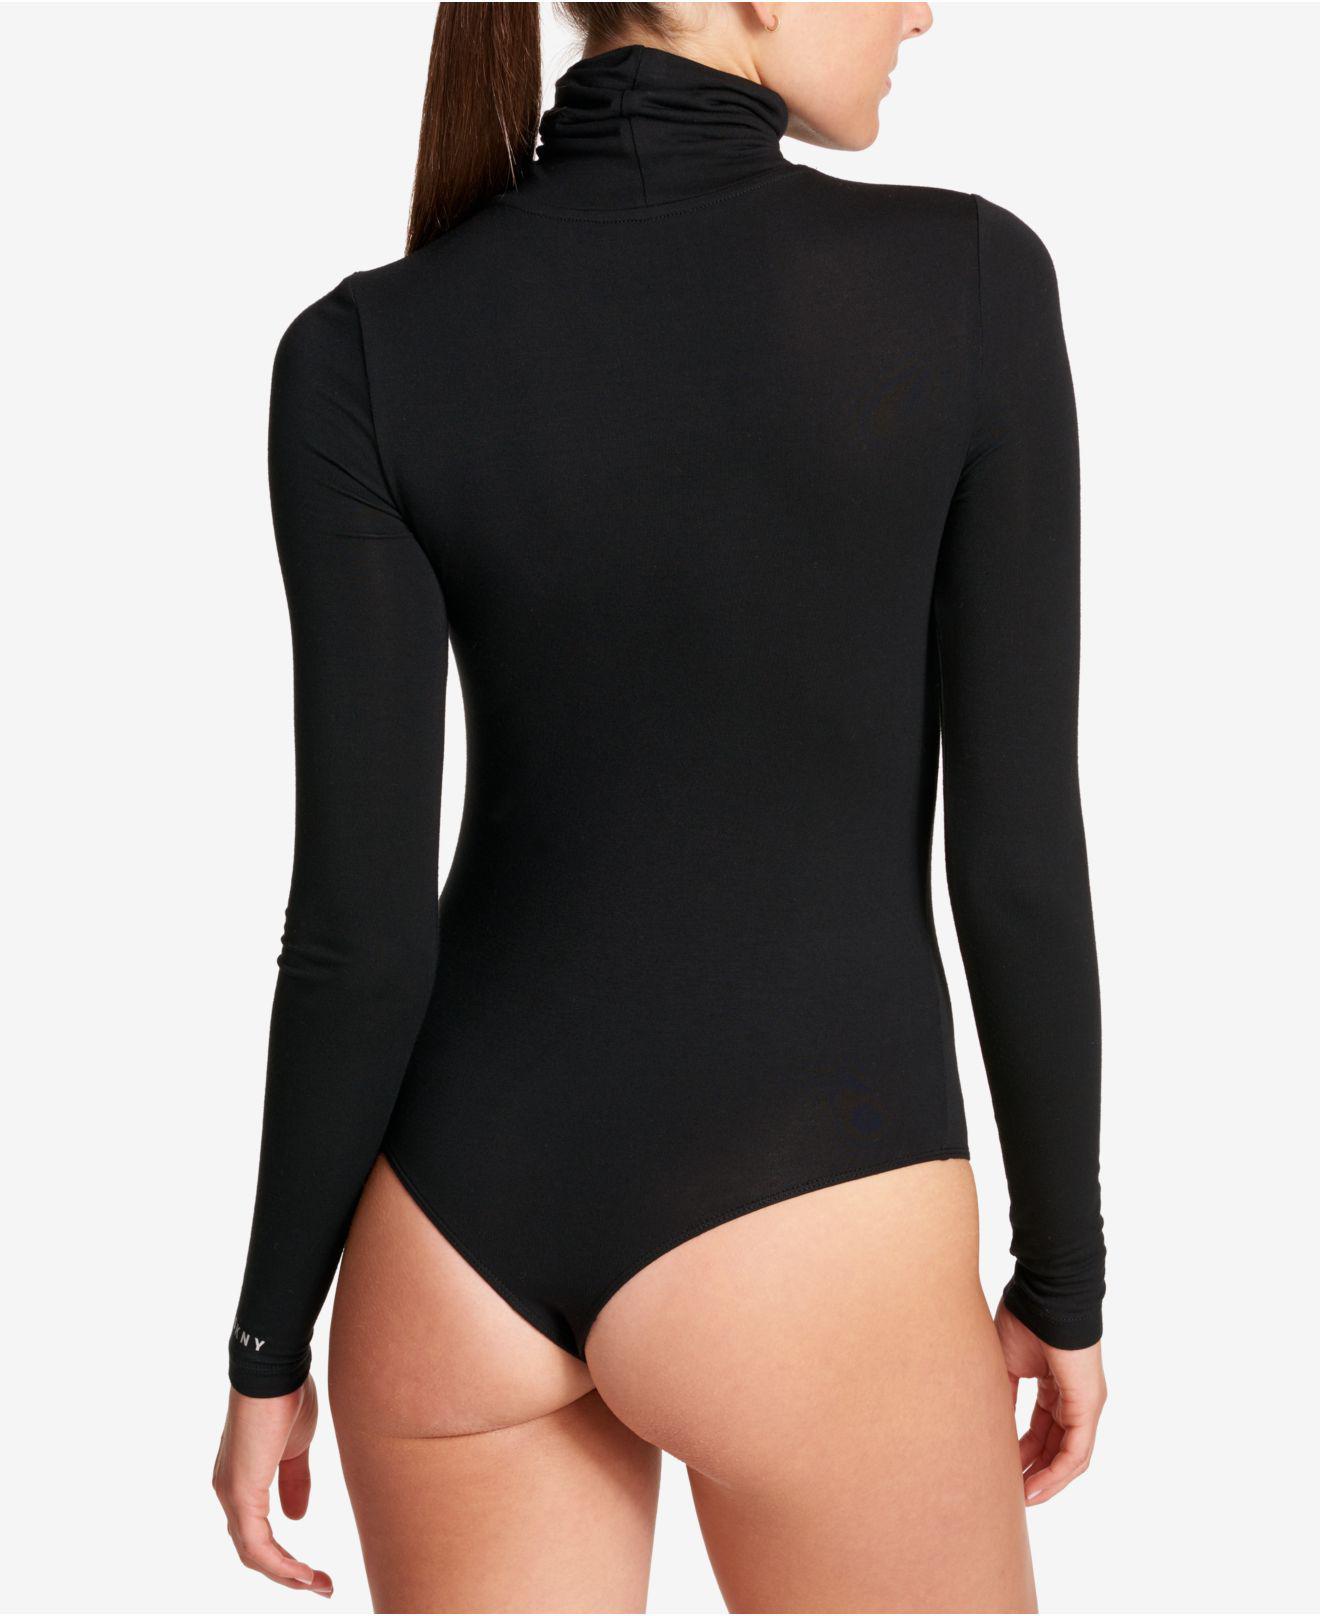 e89155cf725 Lyst - DKNY Turtleneck Active Bodysuit in Black